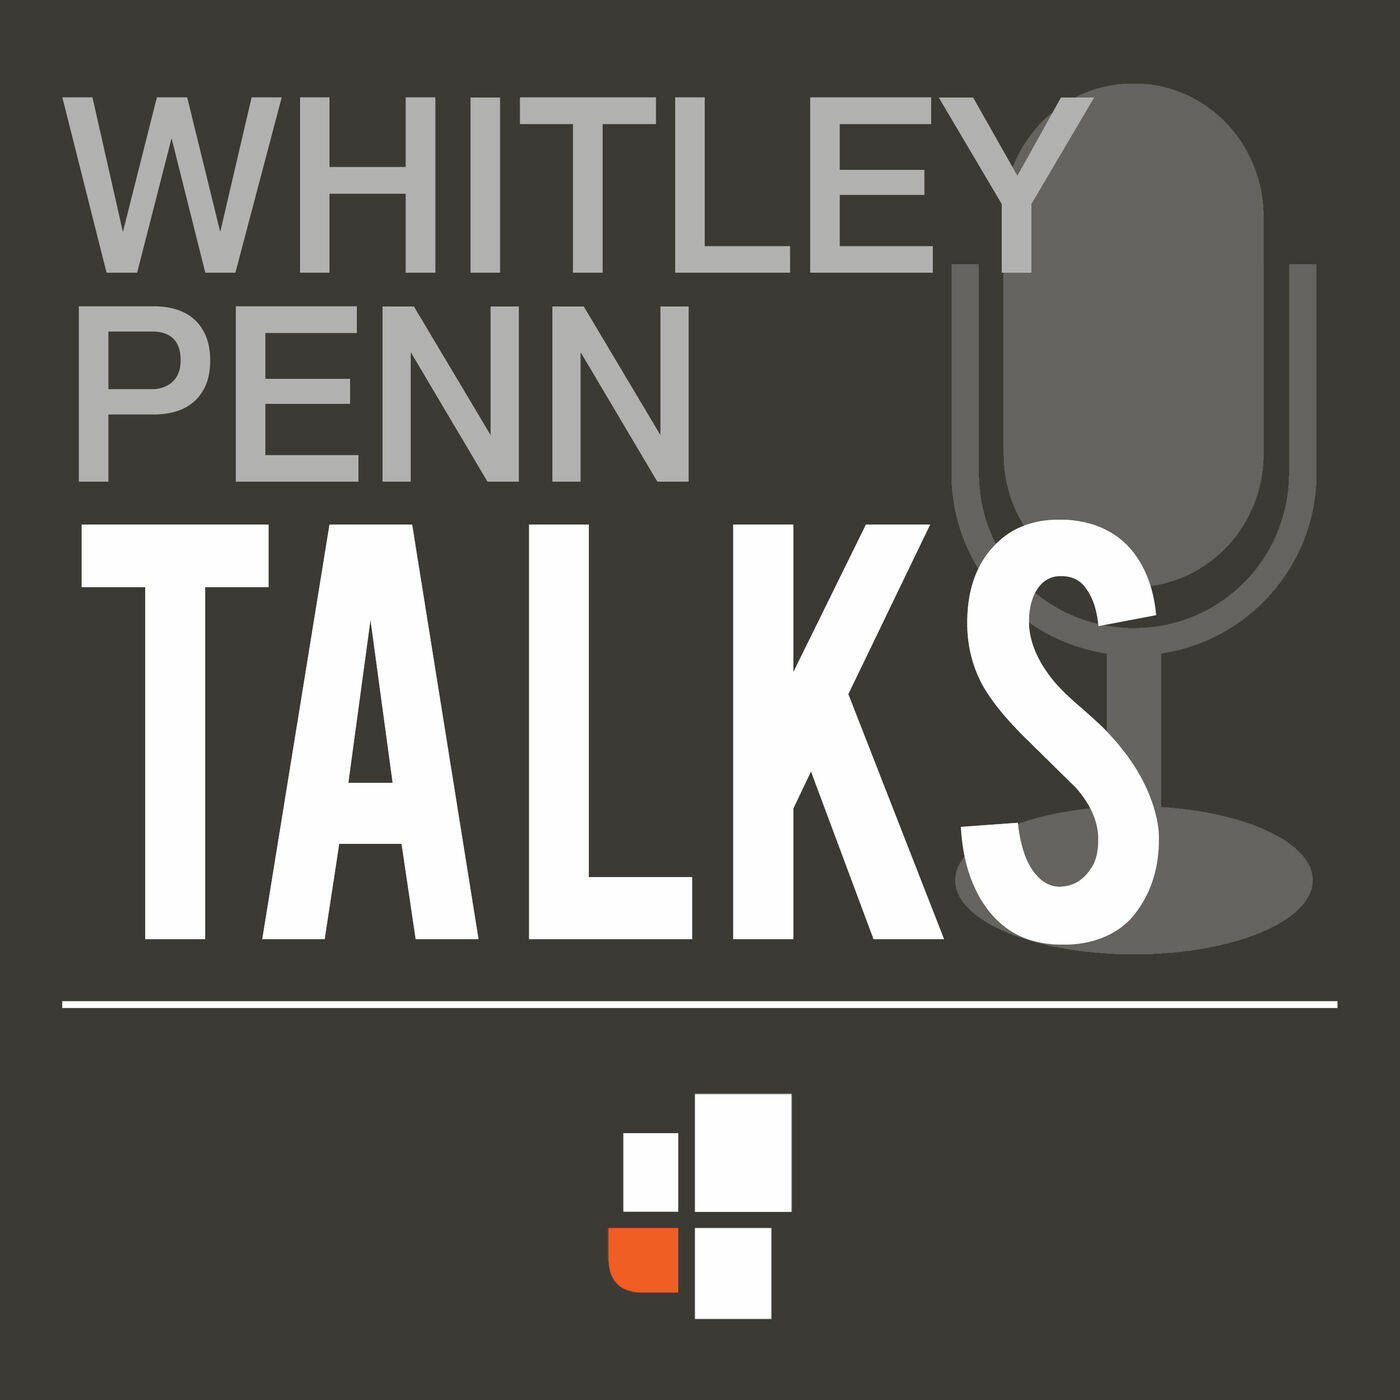 Whitley Penn Talks